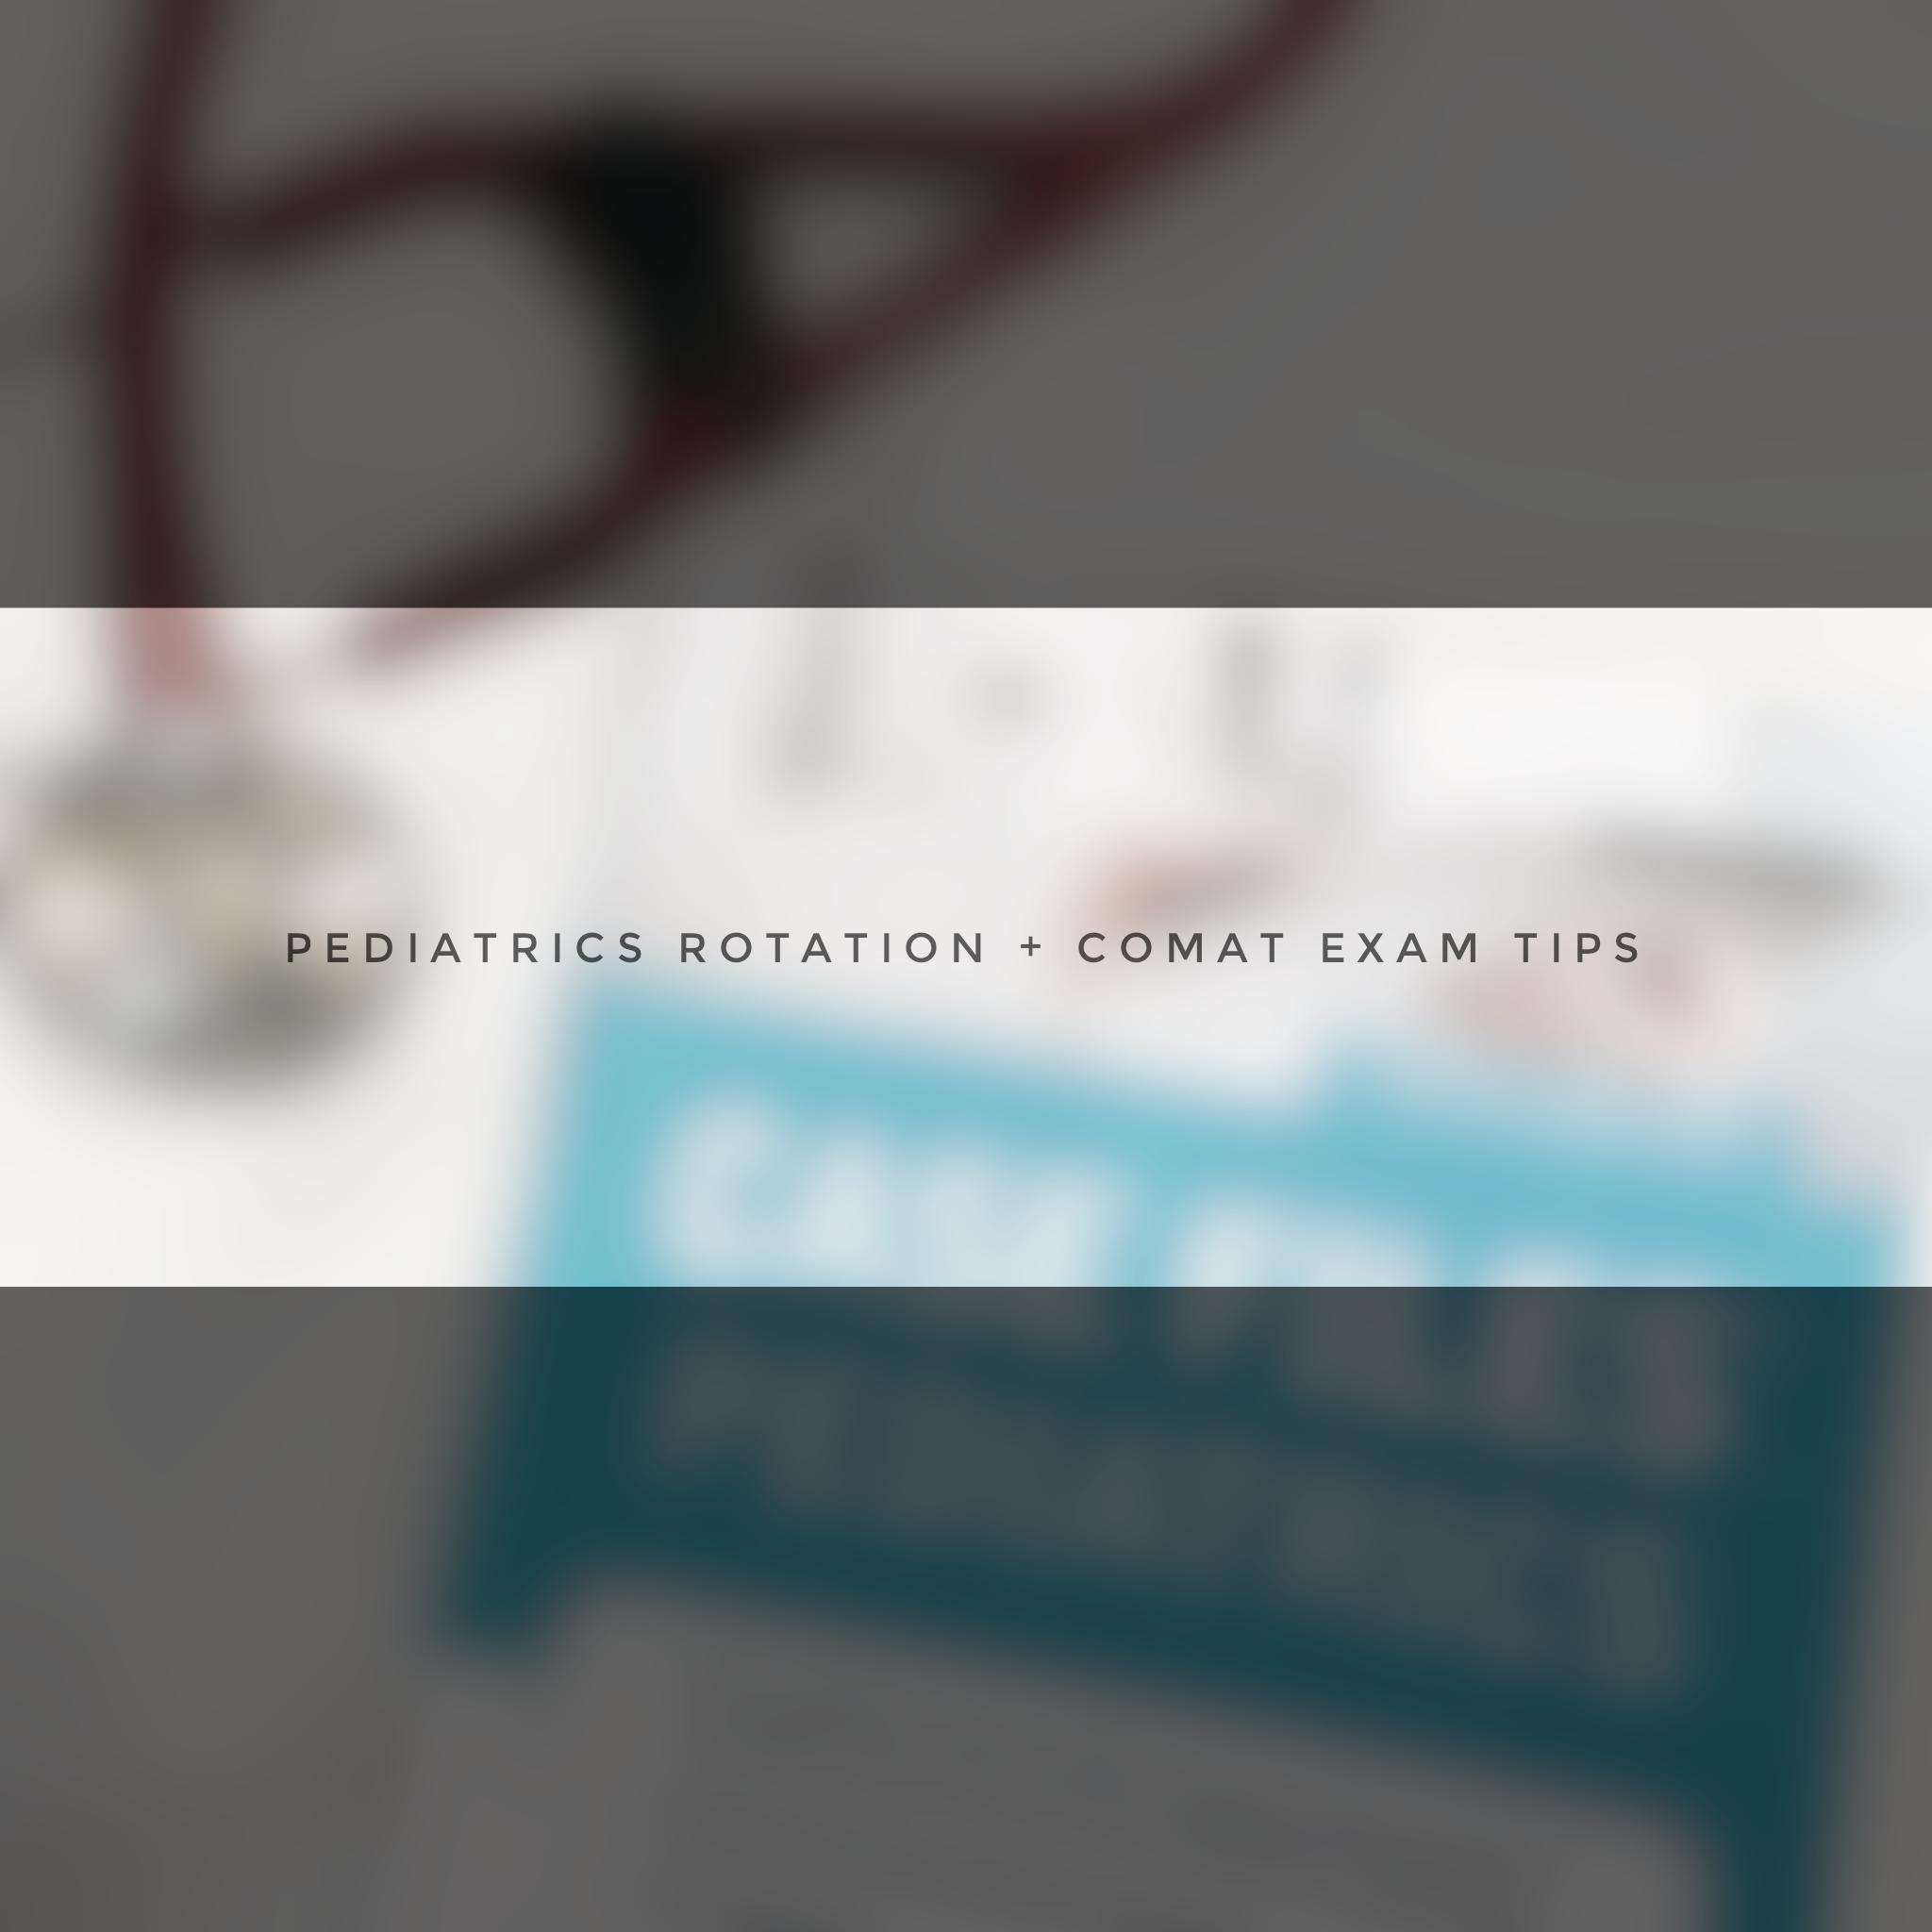 Pediatrics Rotation + COMAT Tips